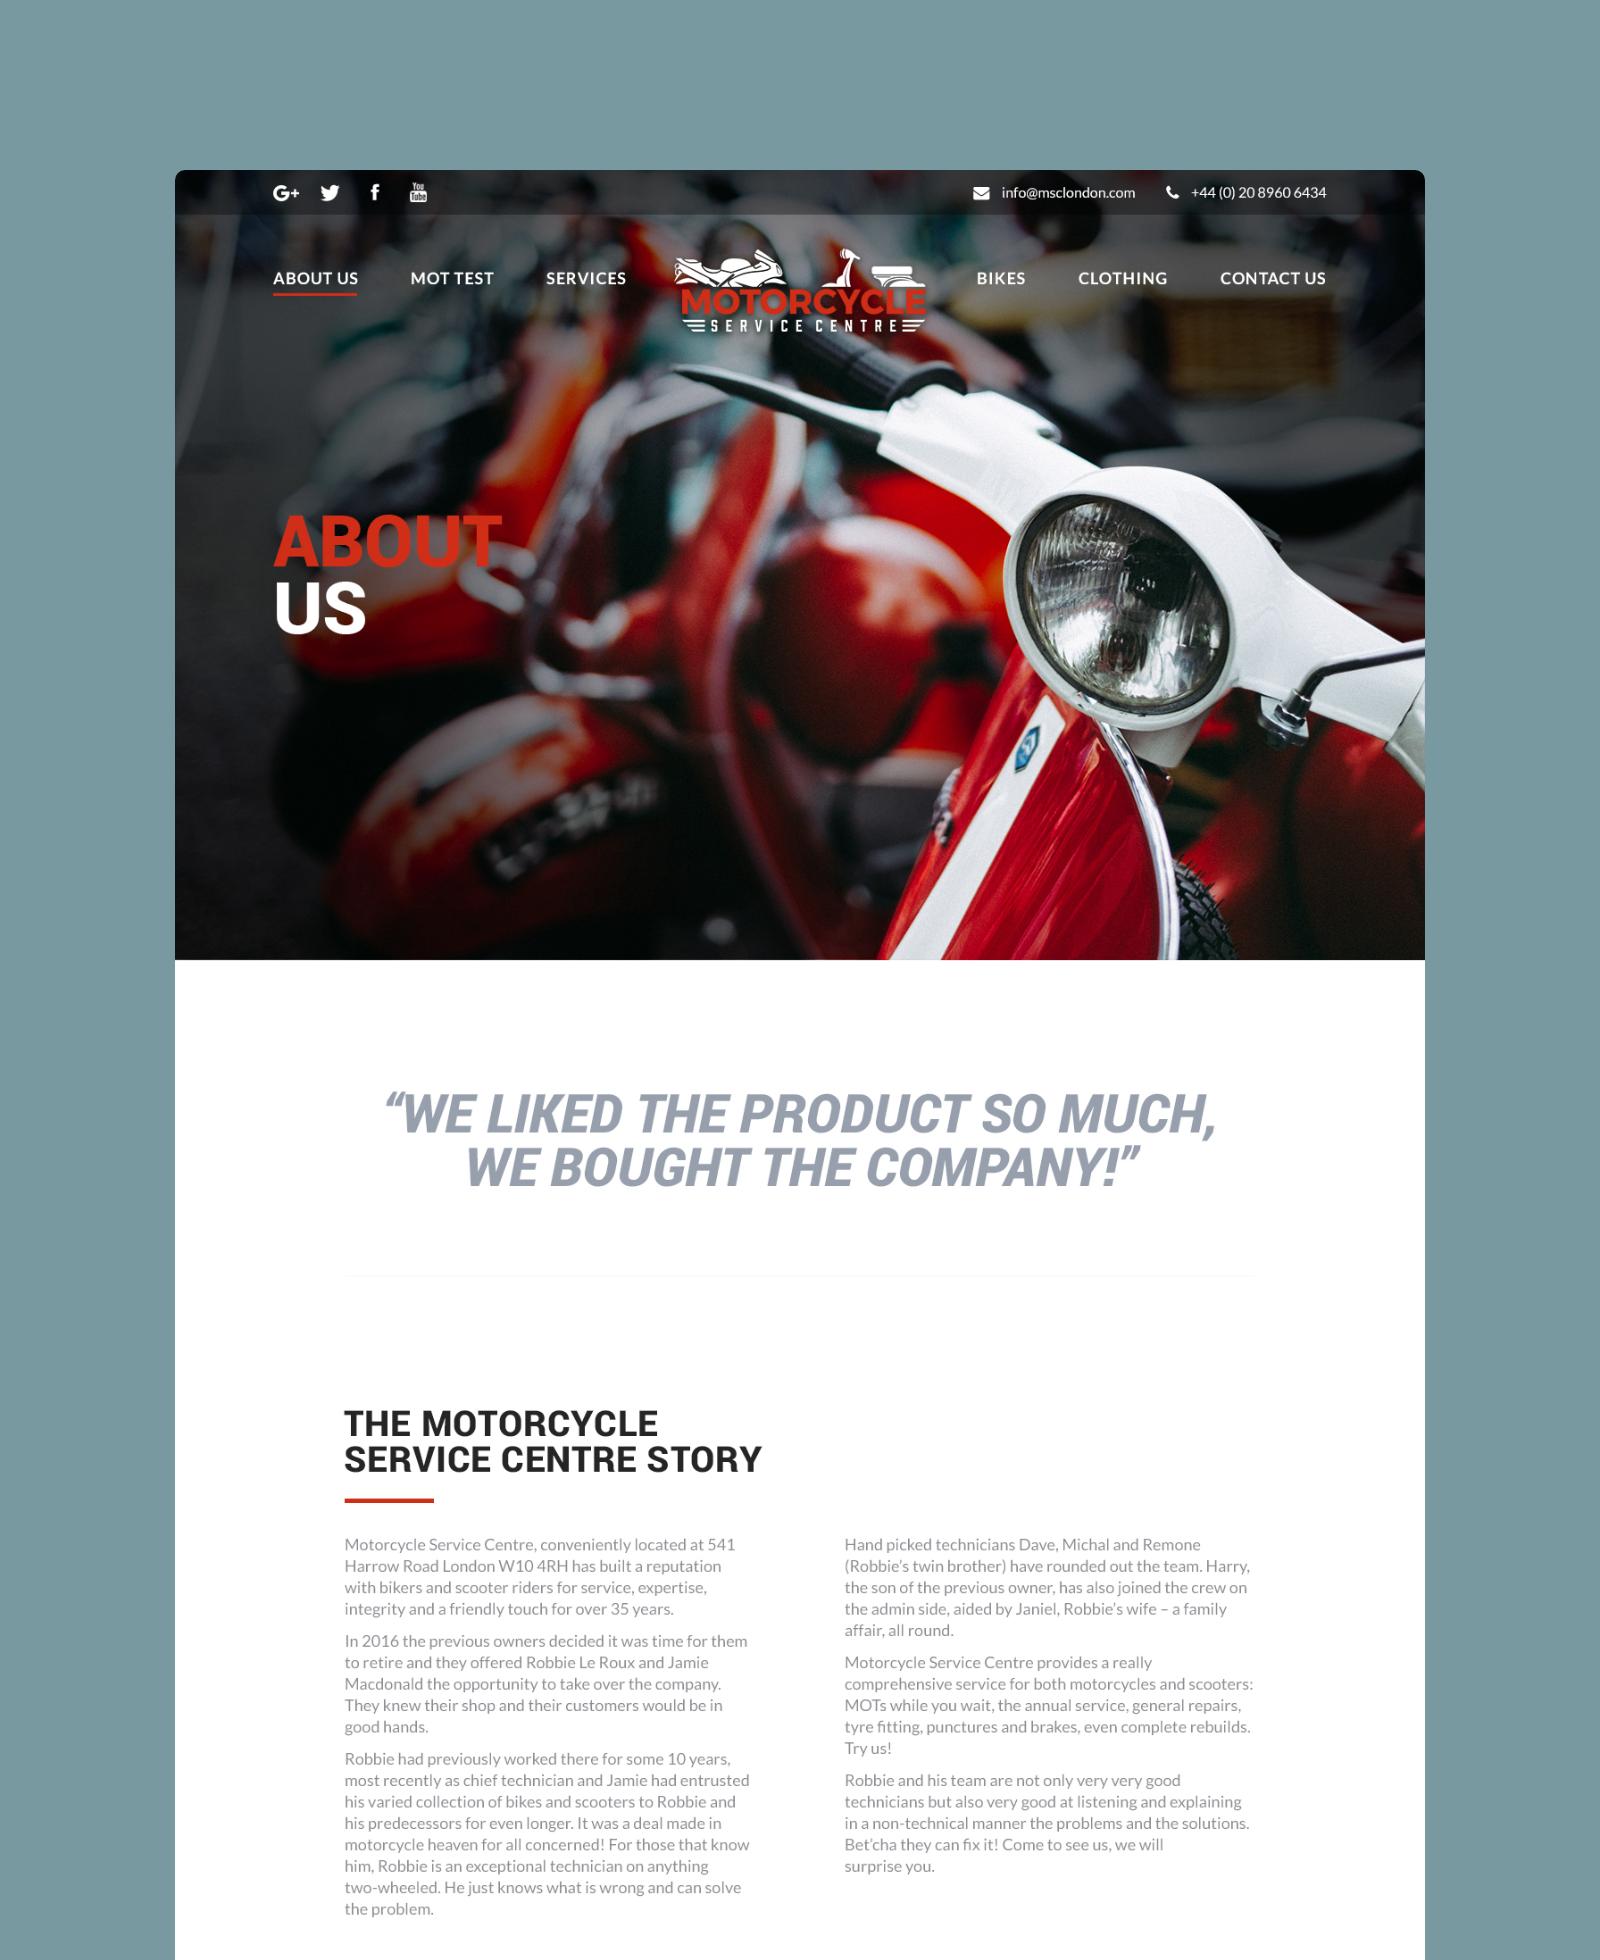 Motorcycle Service Centre Story